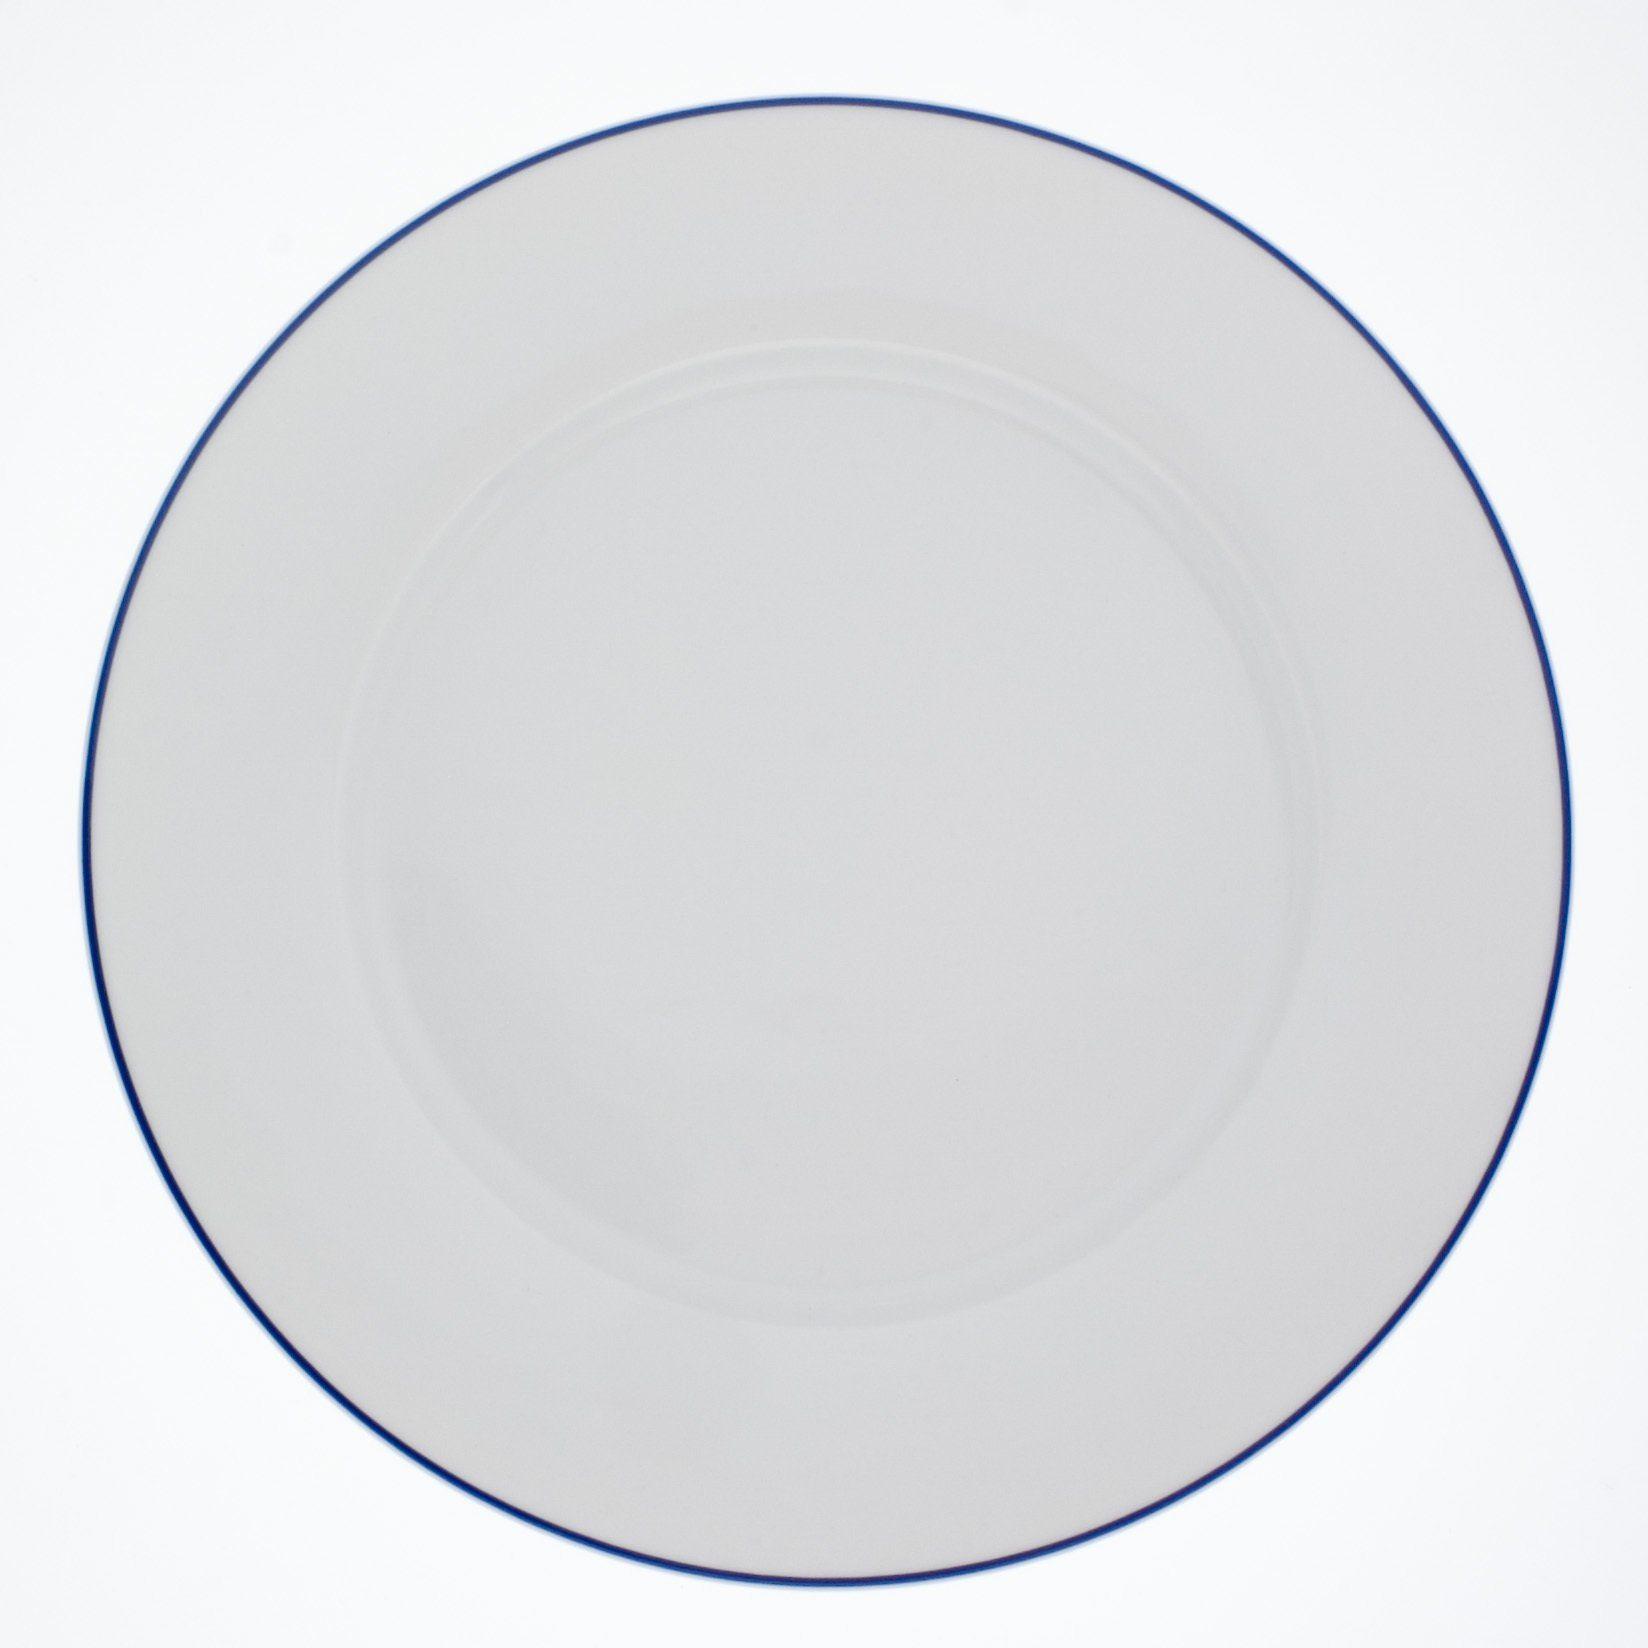 Kahla Speiseteller »Aronda Blaue Linie«